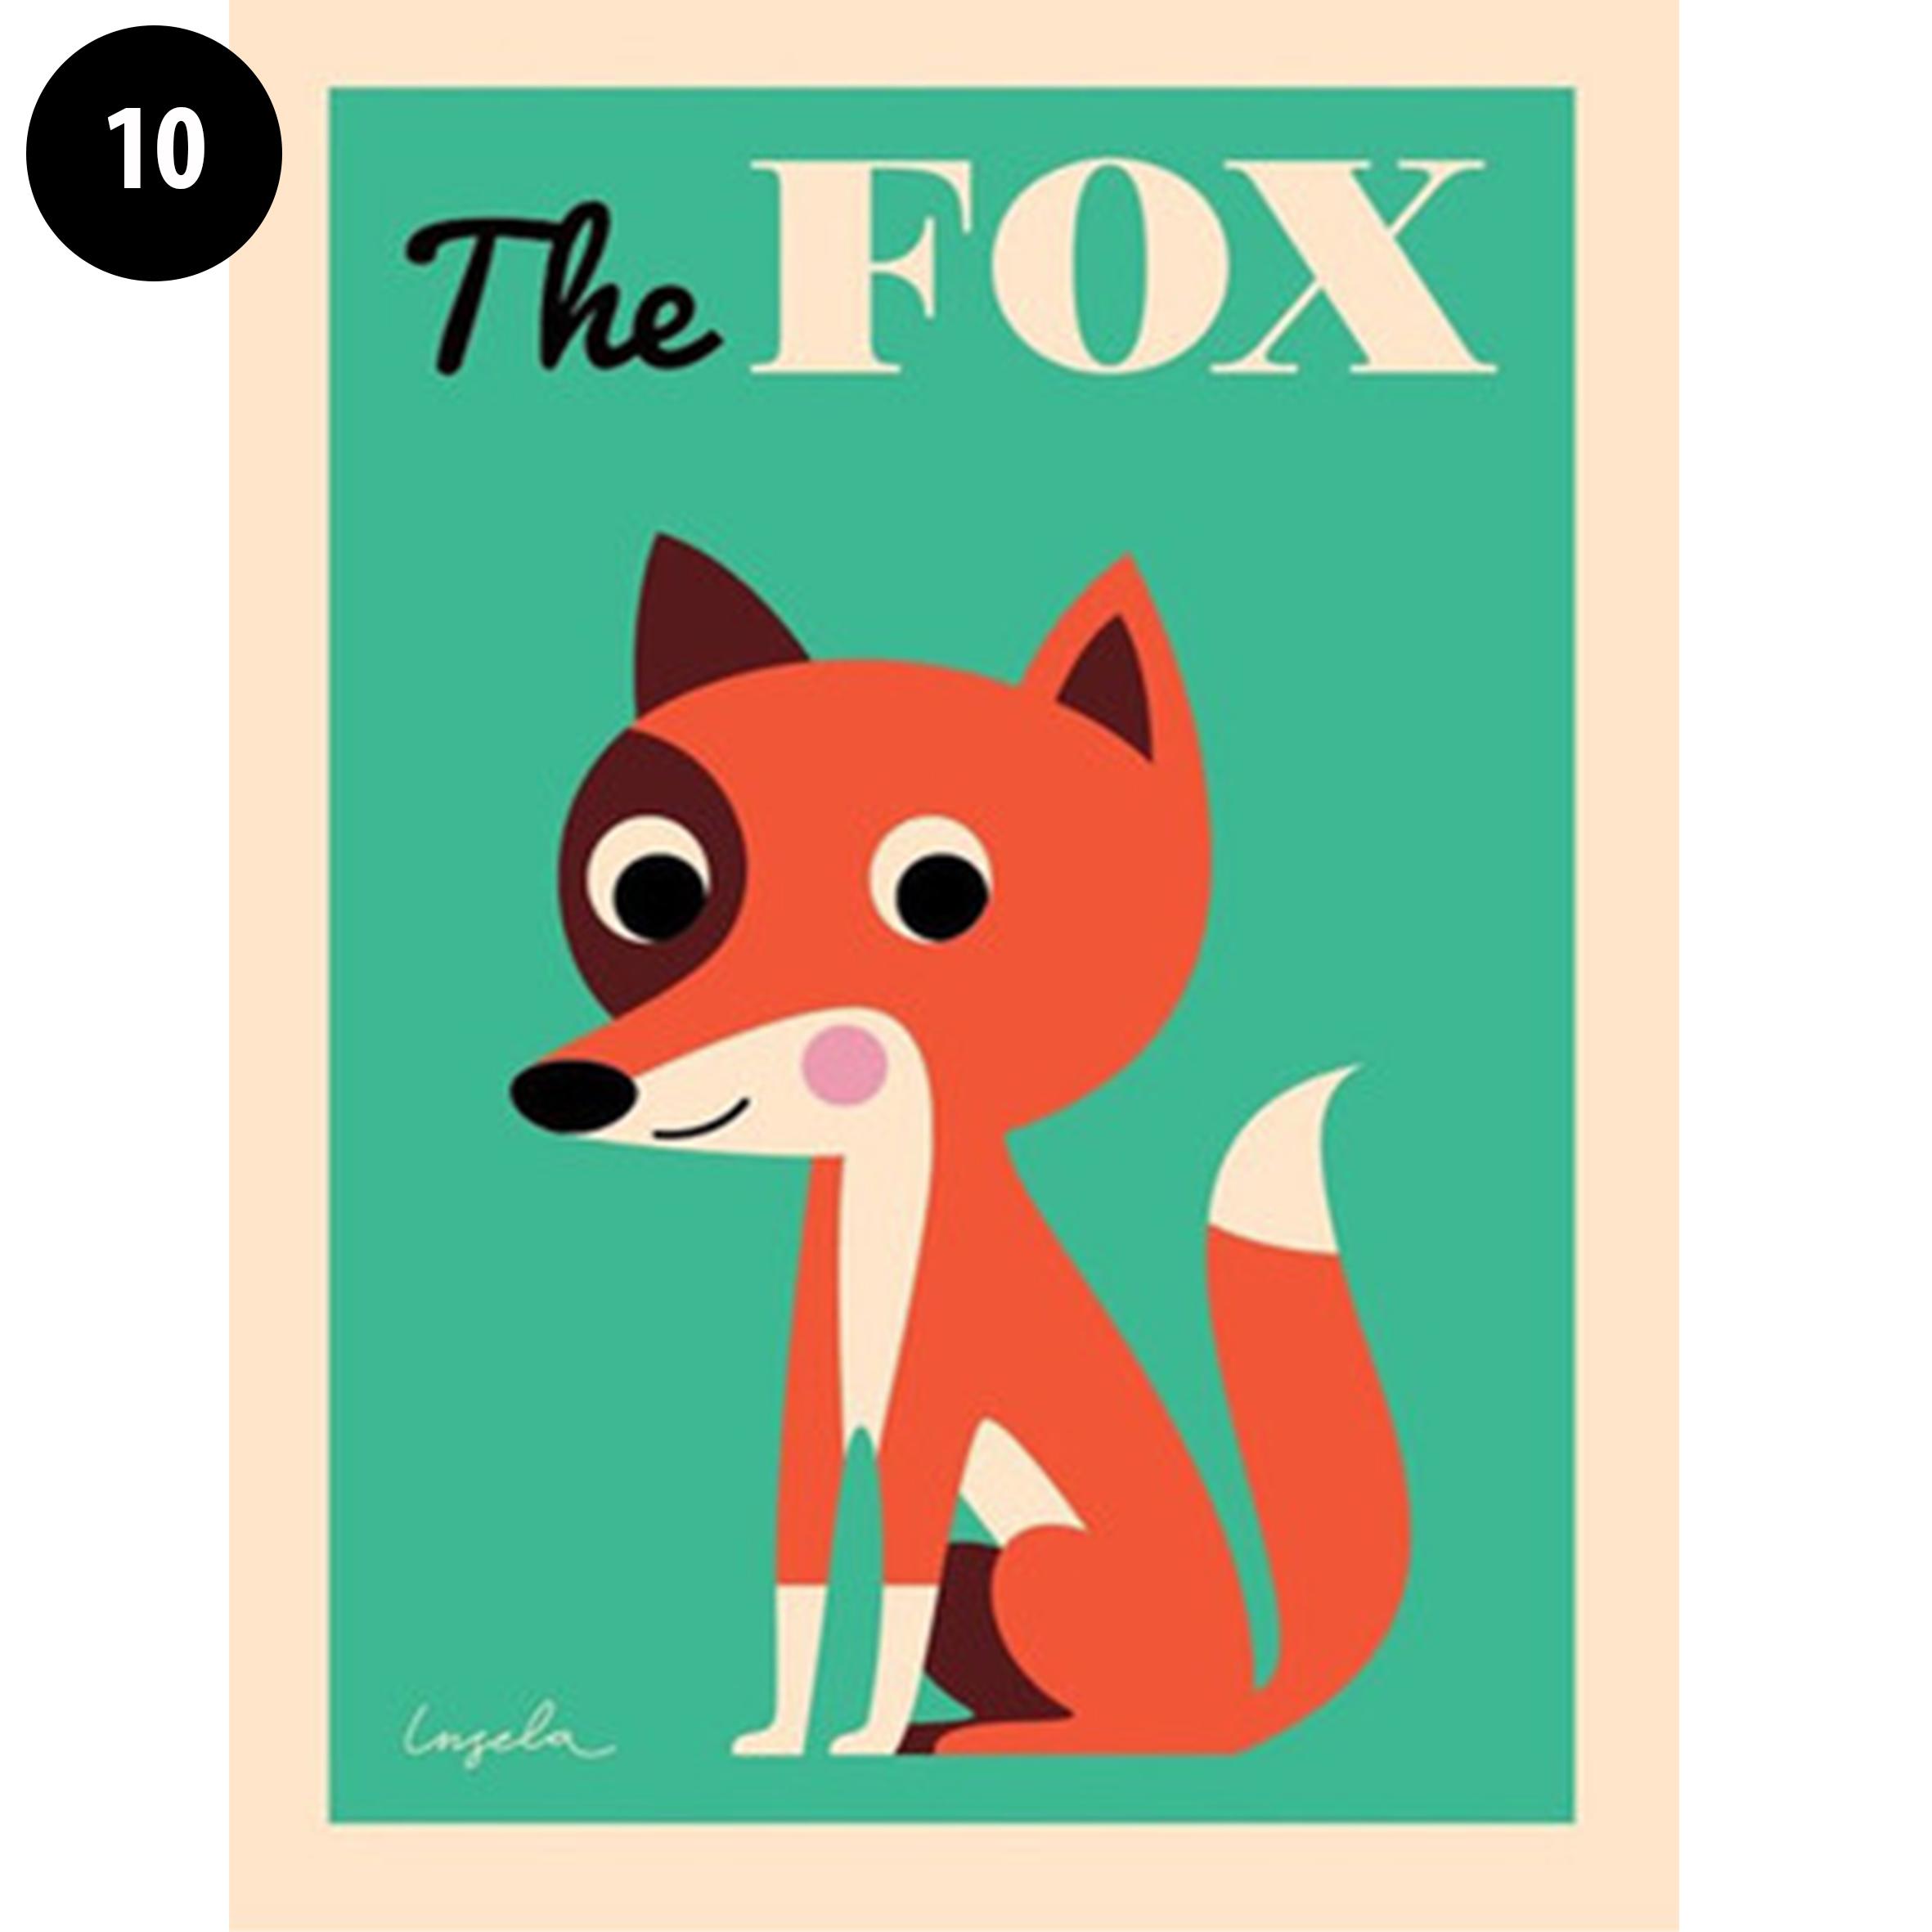 The fox poster.jpg